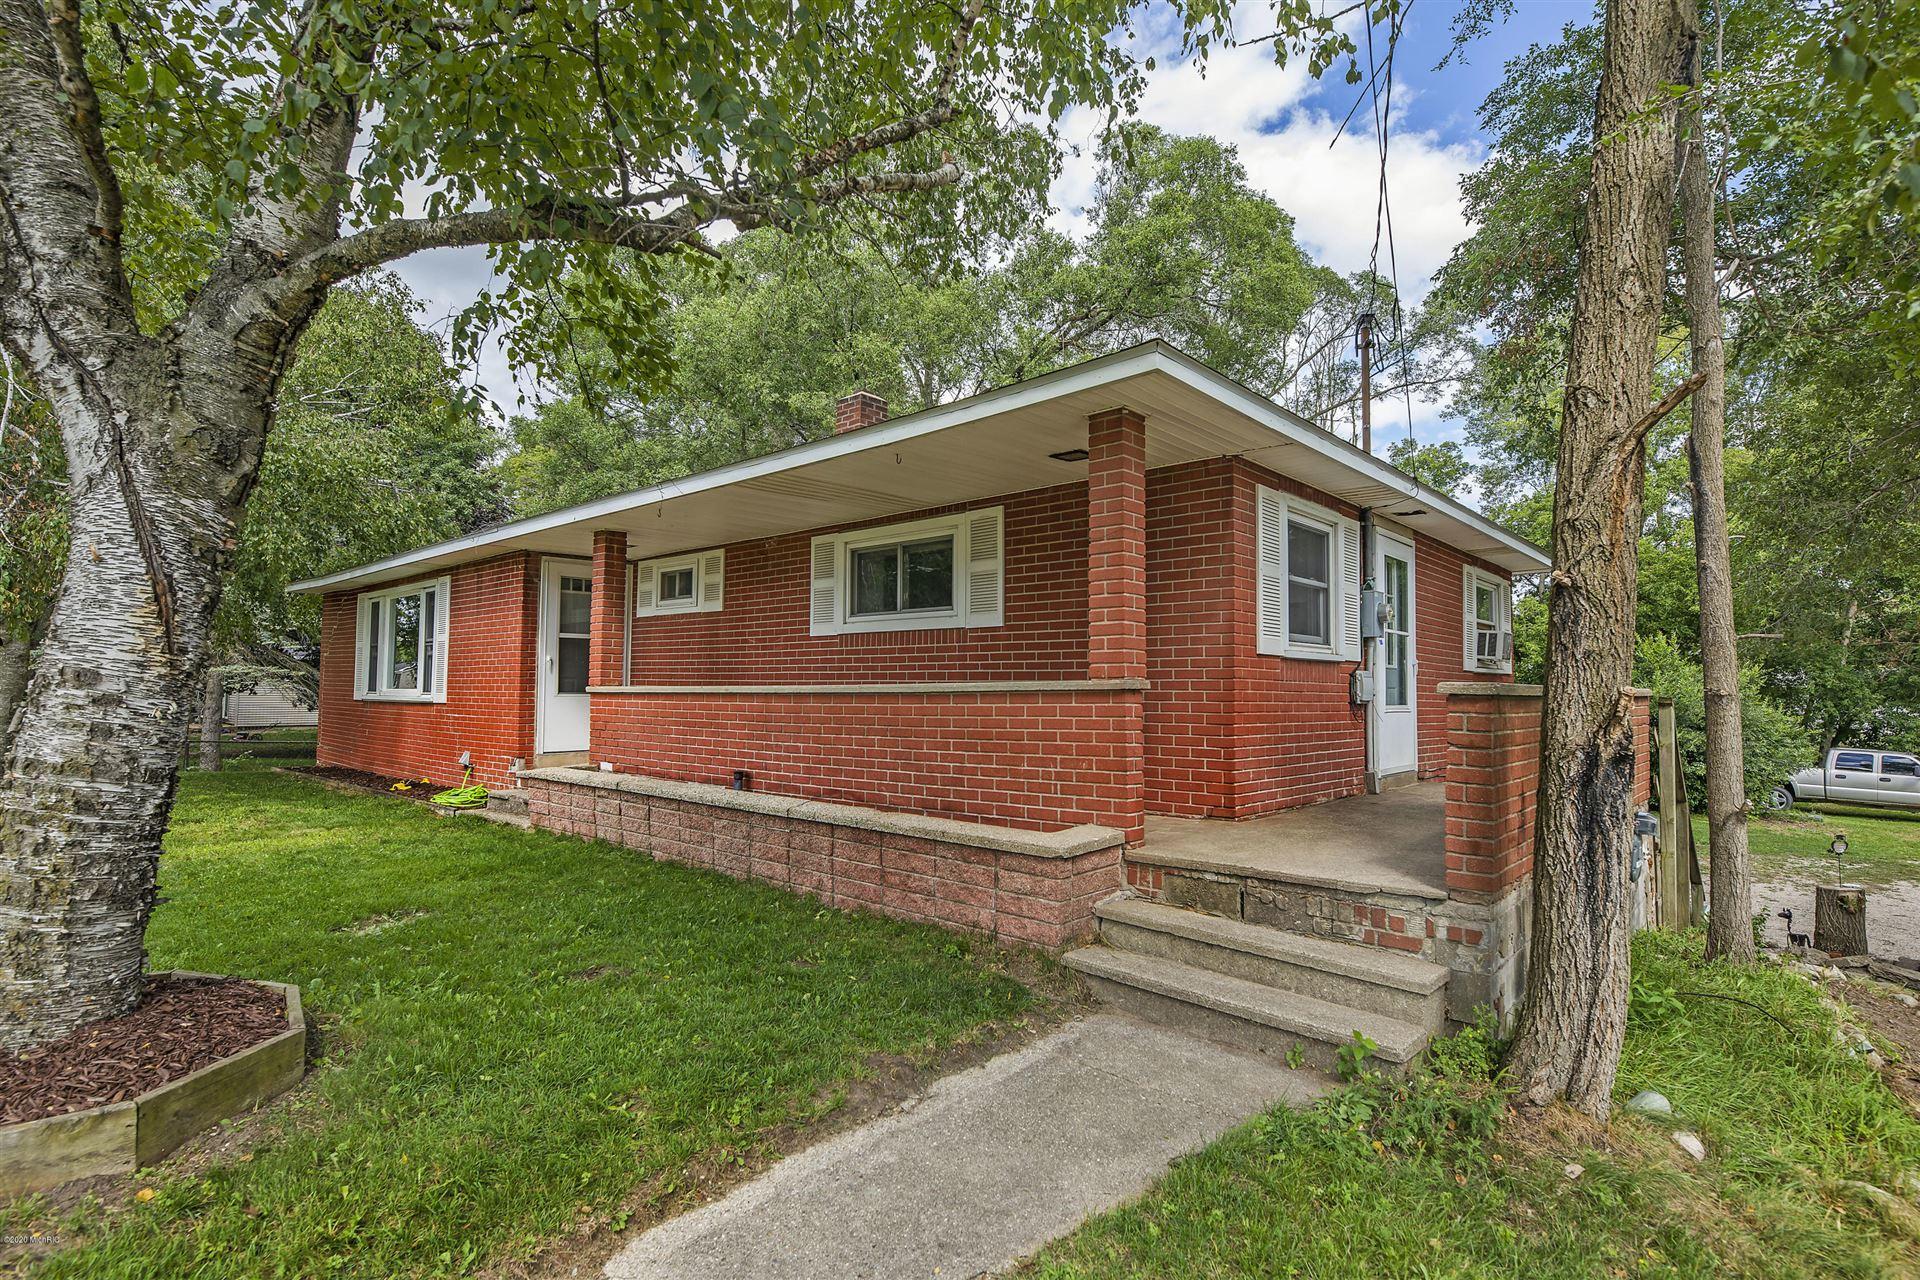 810 Henderson Street, Big Rapids, MI 49307 - #: 20000695